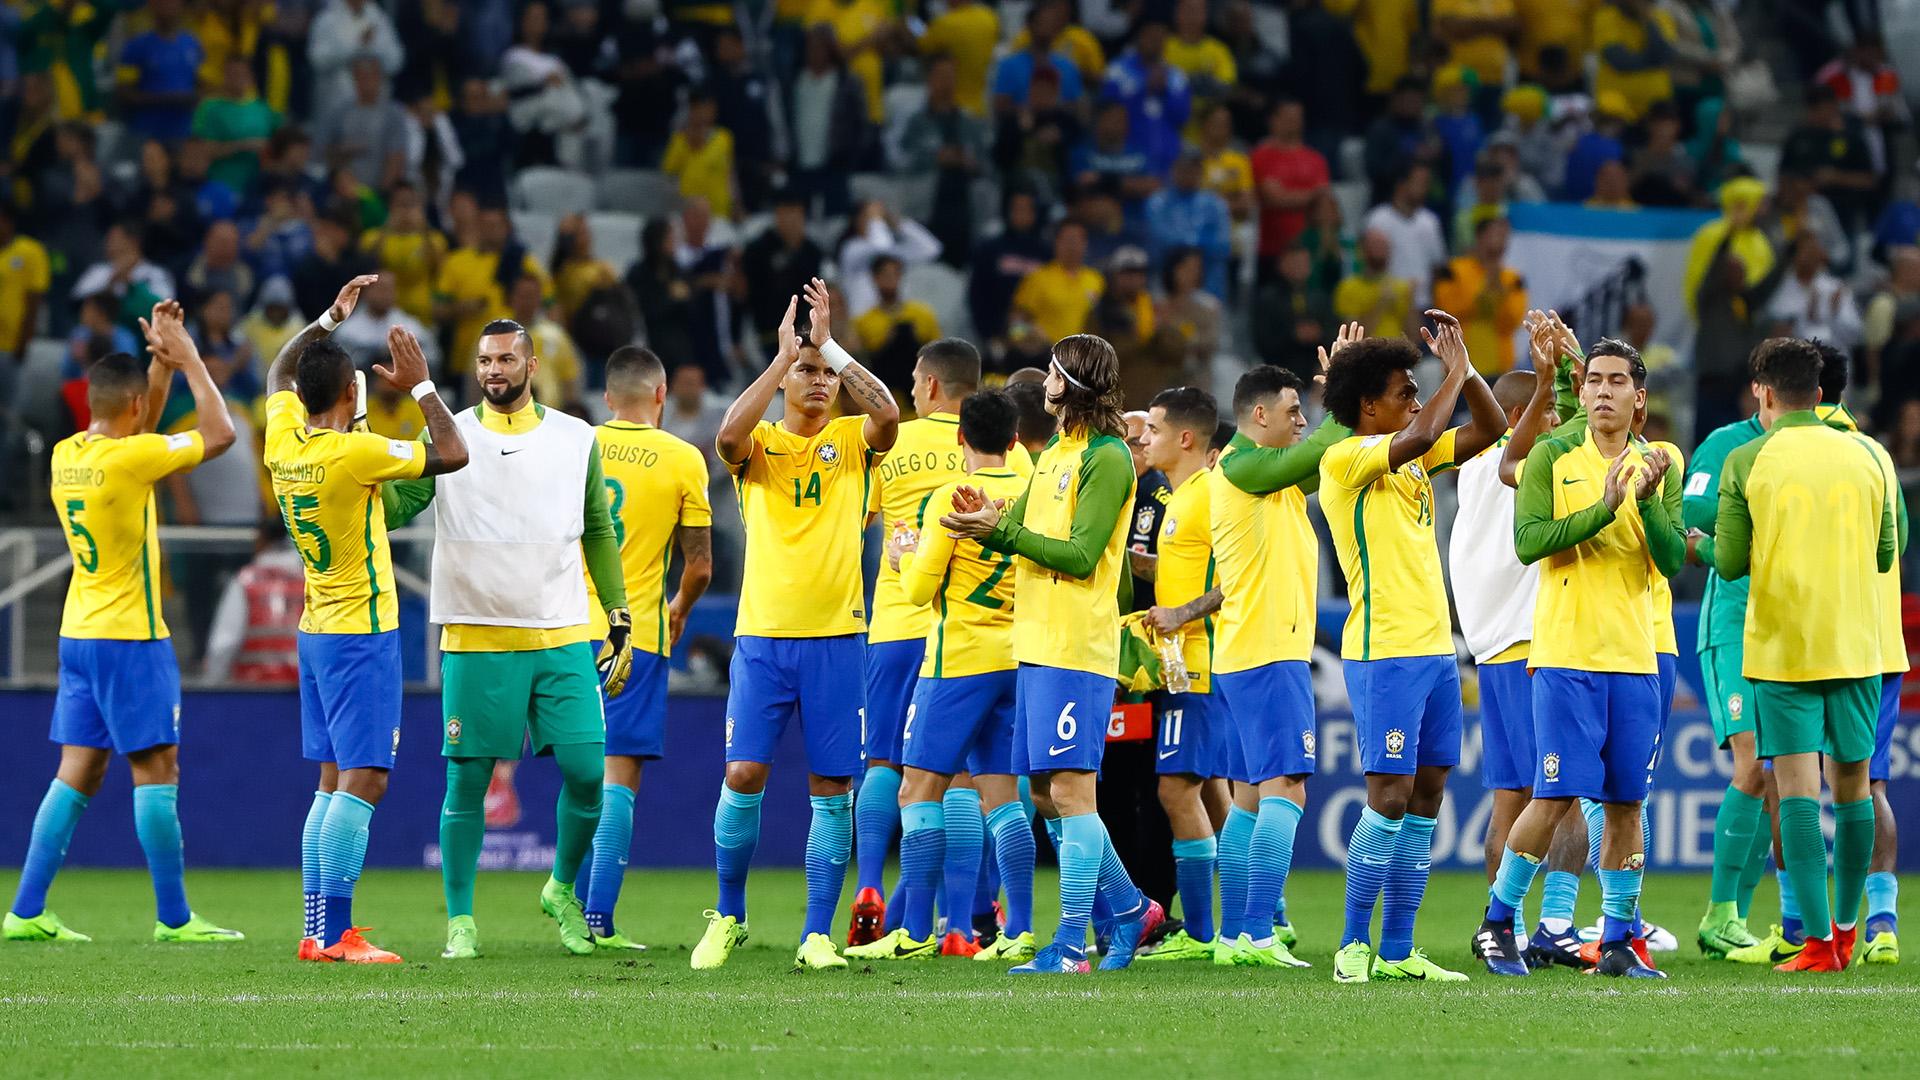 Brasil Paraguai Eliminatorias 2018 28032017